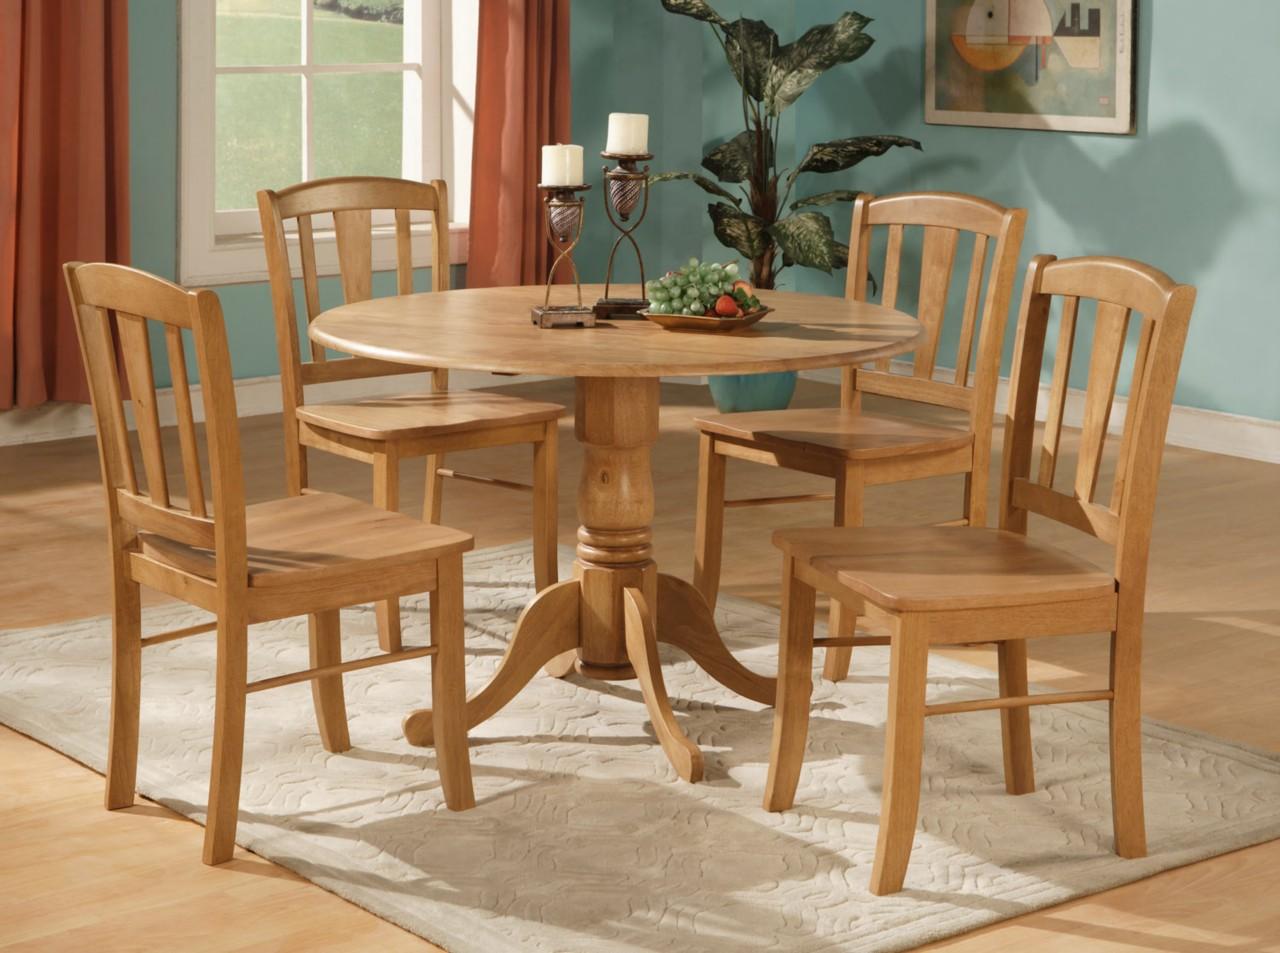 round kitchen table sets photo - 2